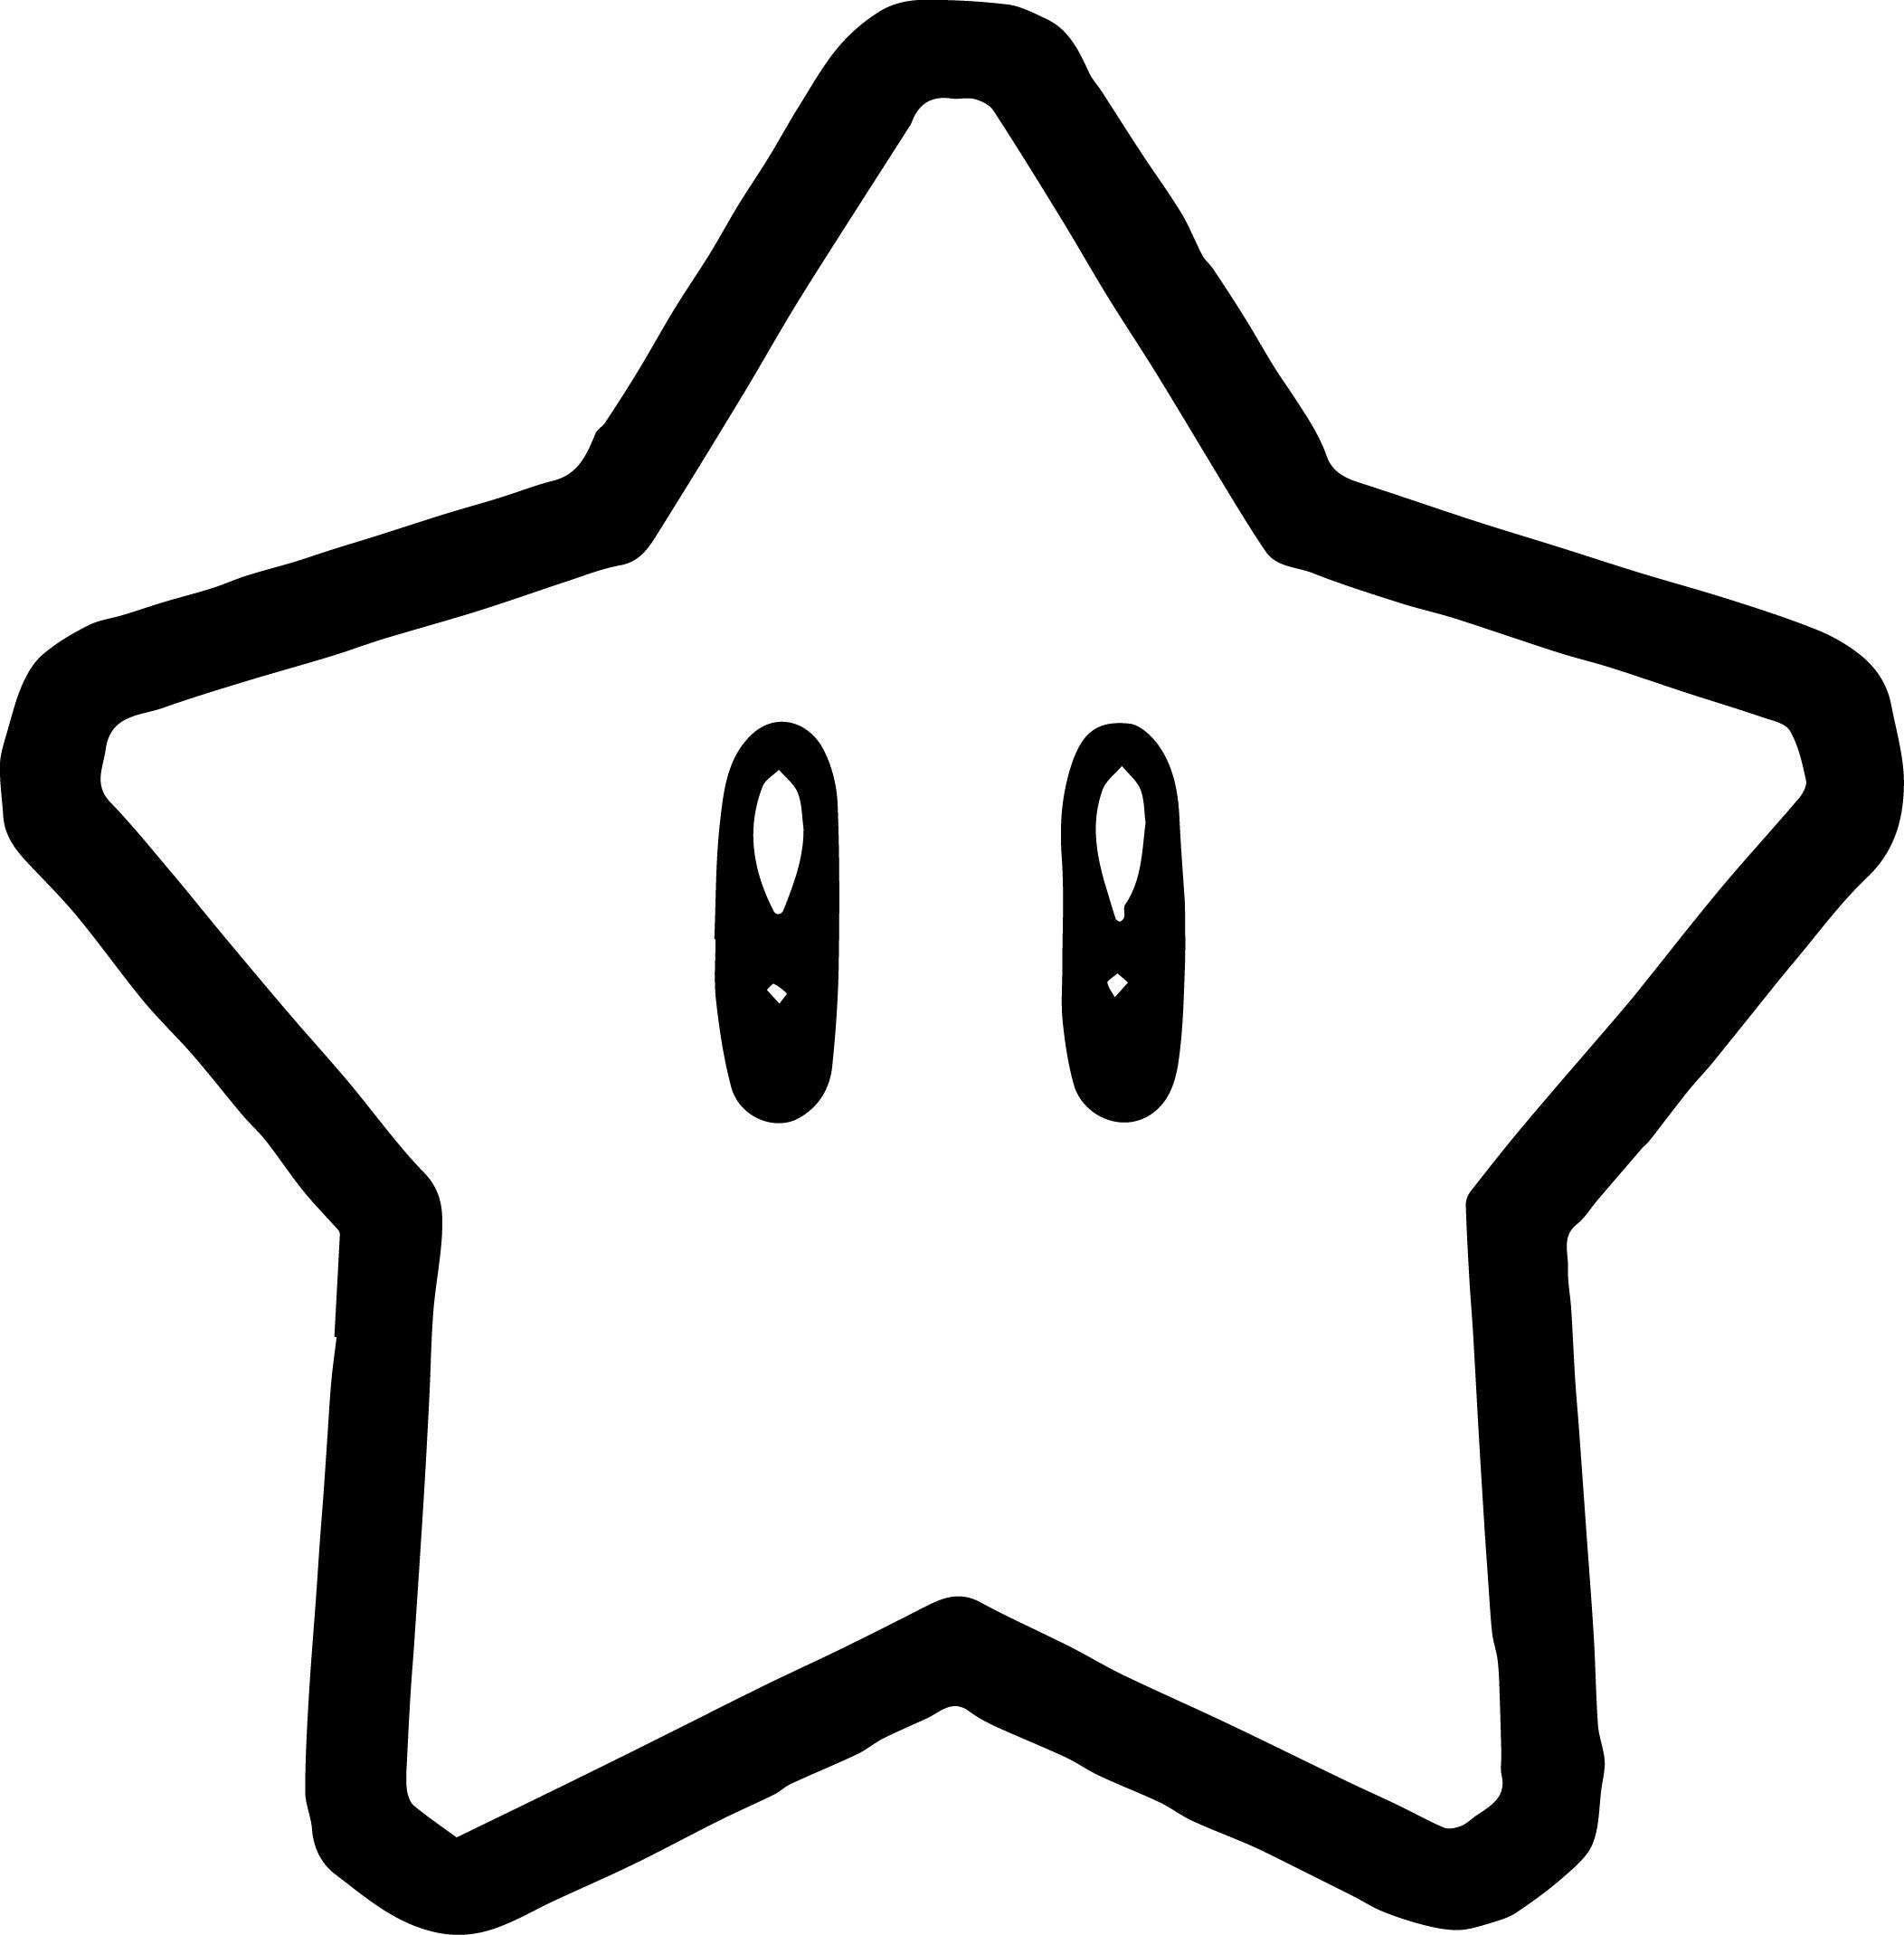 Super Mario Star Coloring Page Wecoloringpage